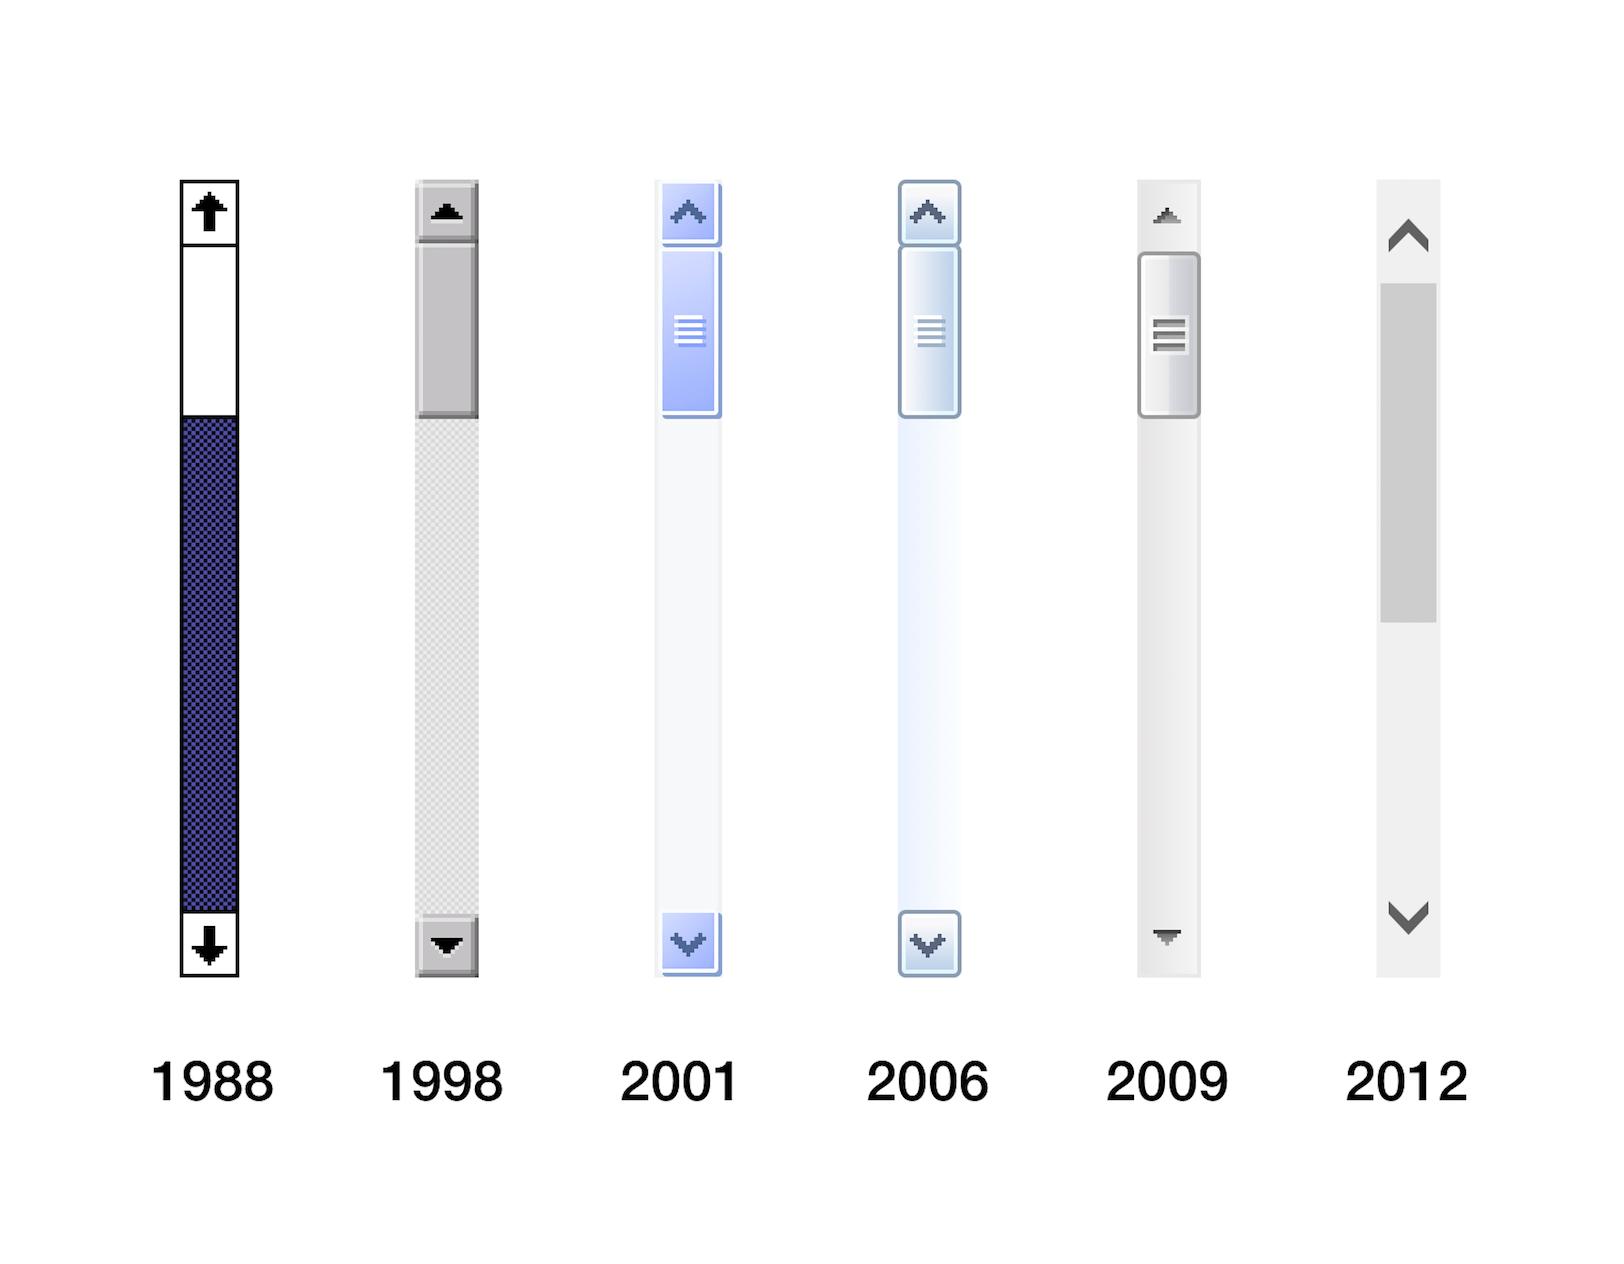 Design Of Windows Scrollbars Over Time Scroll Bar Bar Design Design